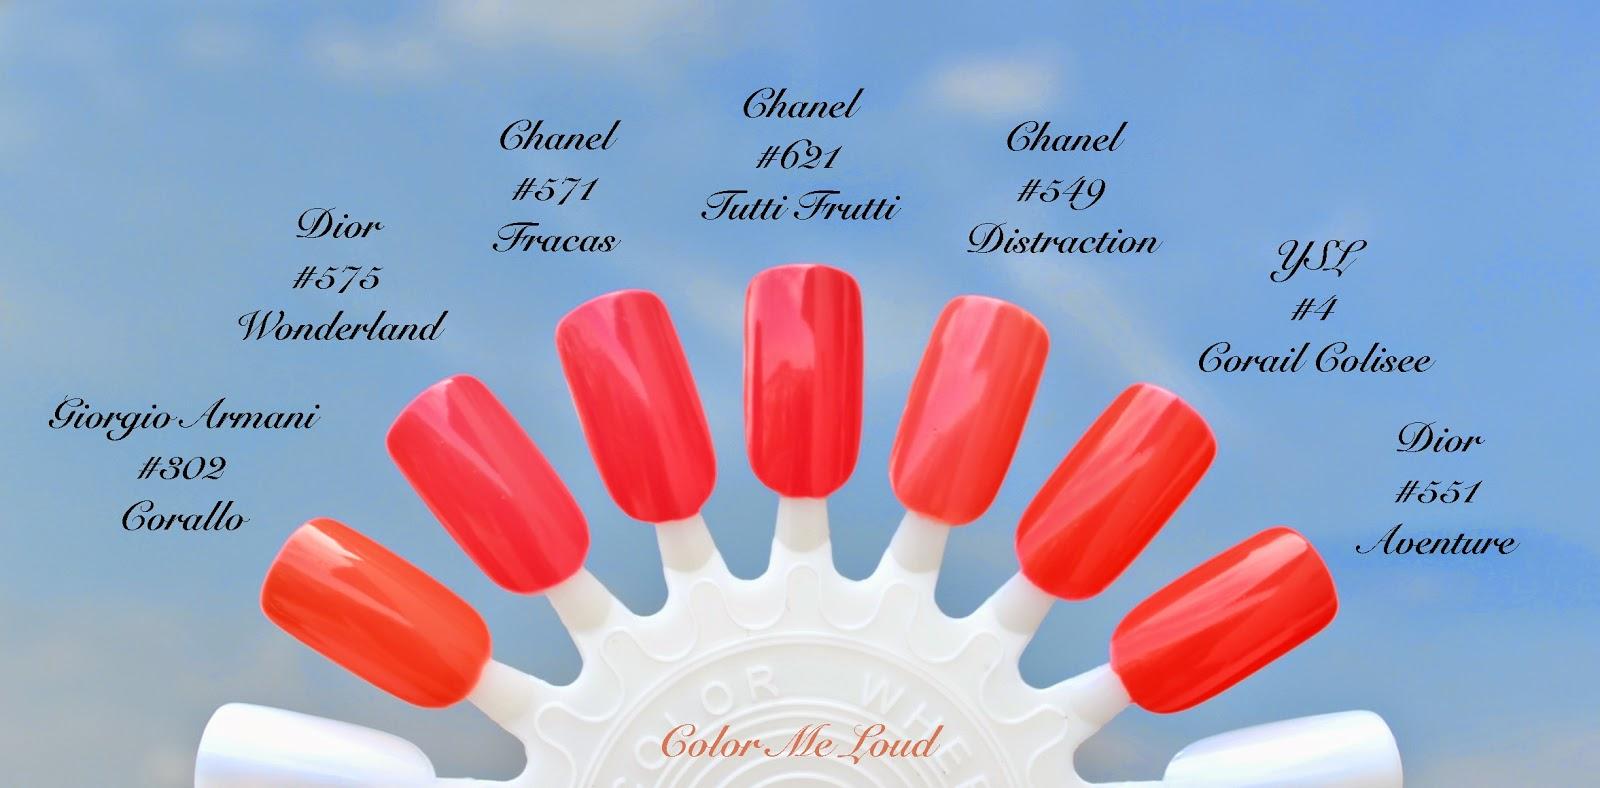 Giorgio Armani 302 Corallo From Bright Ribbon Collection Reviewed Here Is More Orange Chanel Tutti Frutti Now My Favorite Pinkish Coral